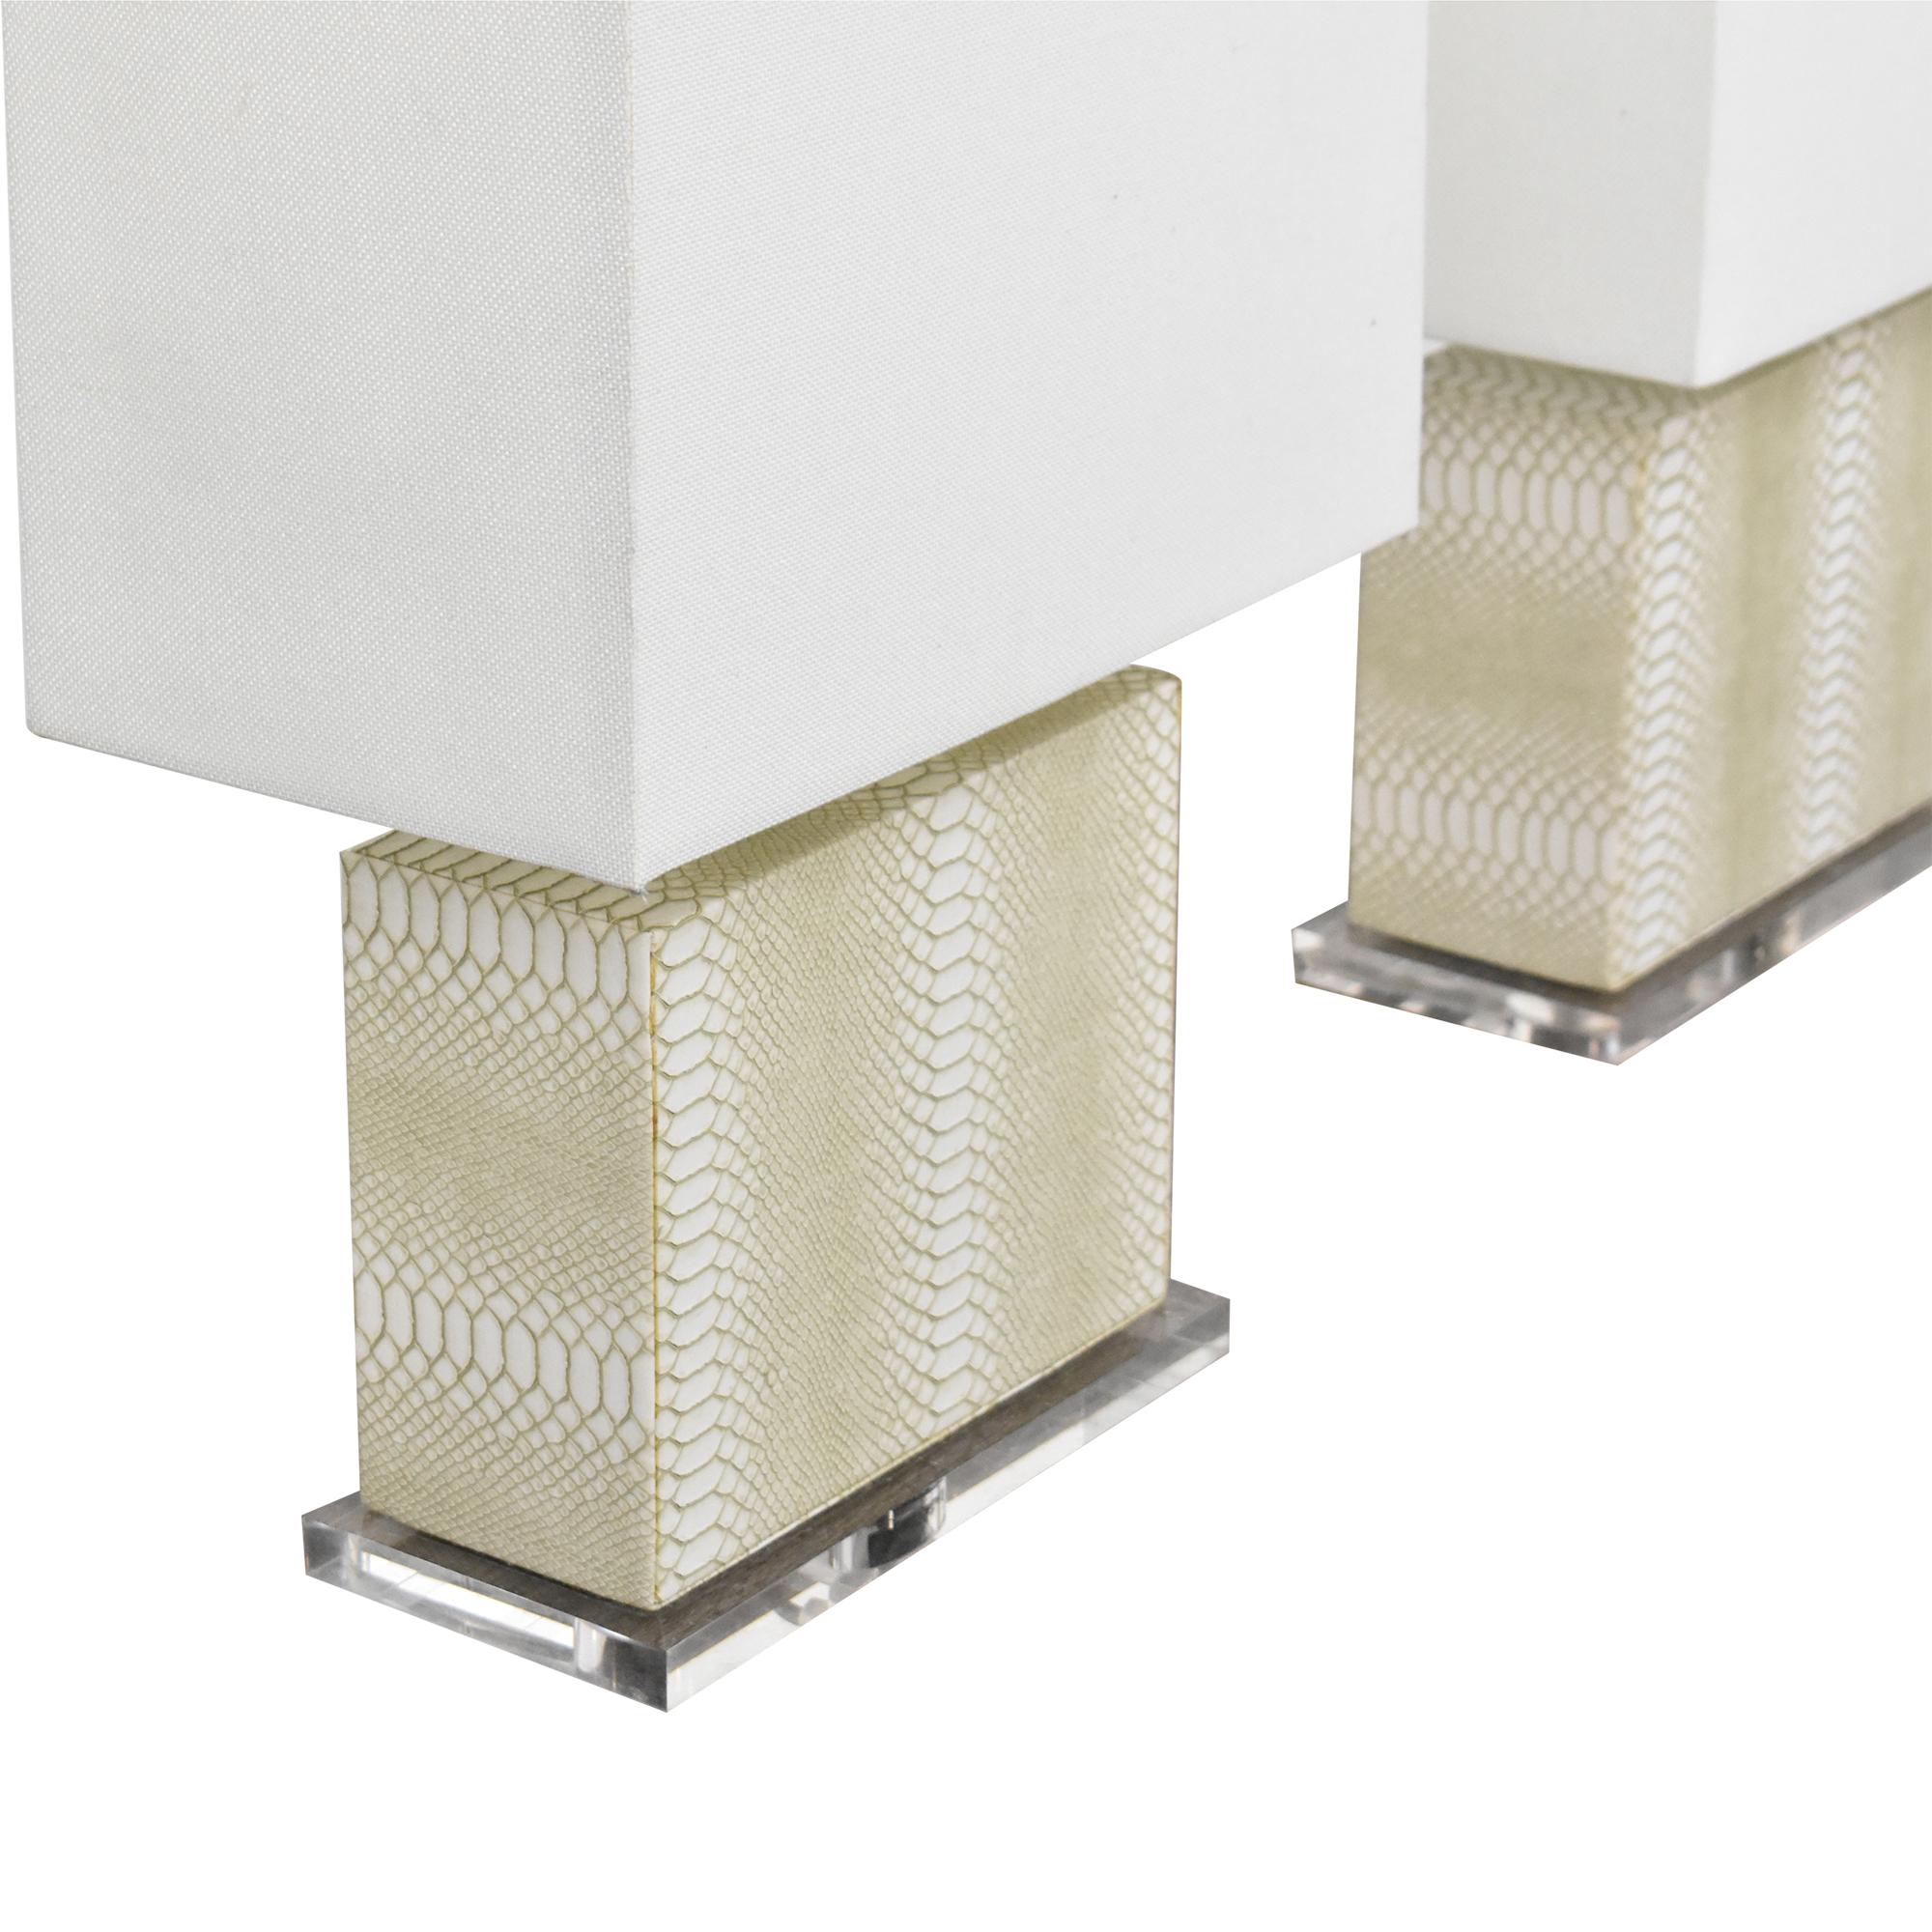 Safavieh Safavieh Delia Table Lamps dimensions